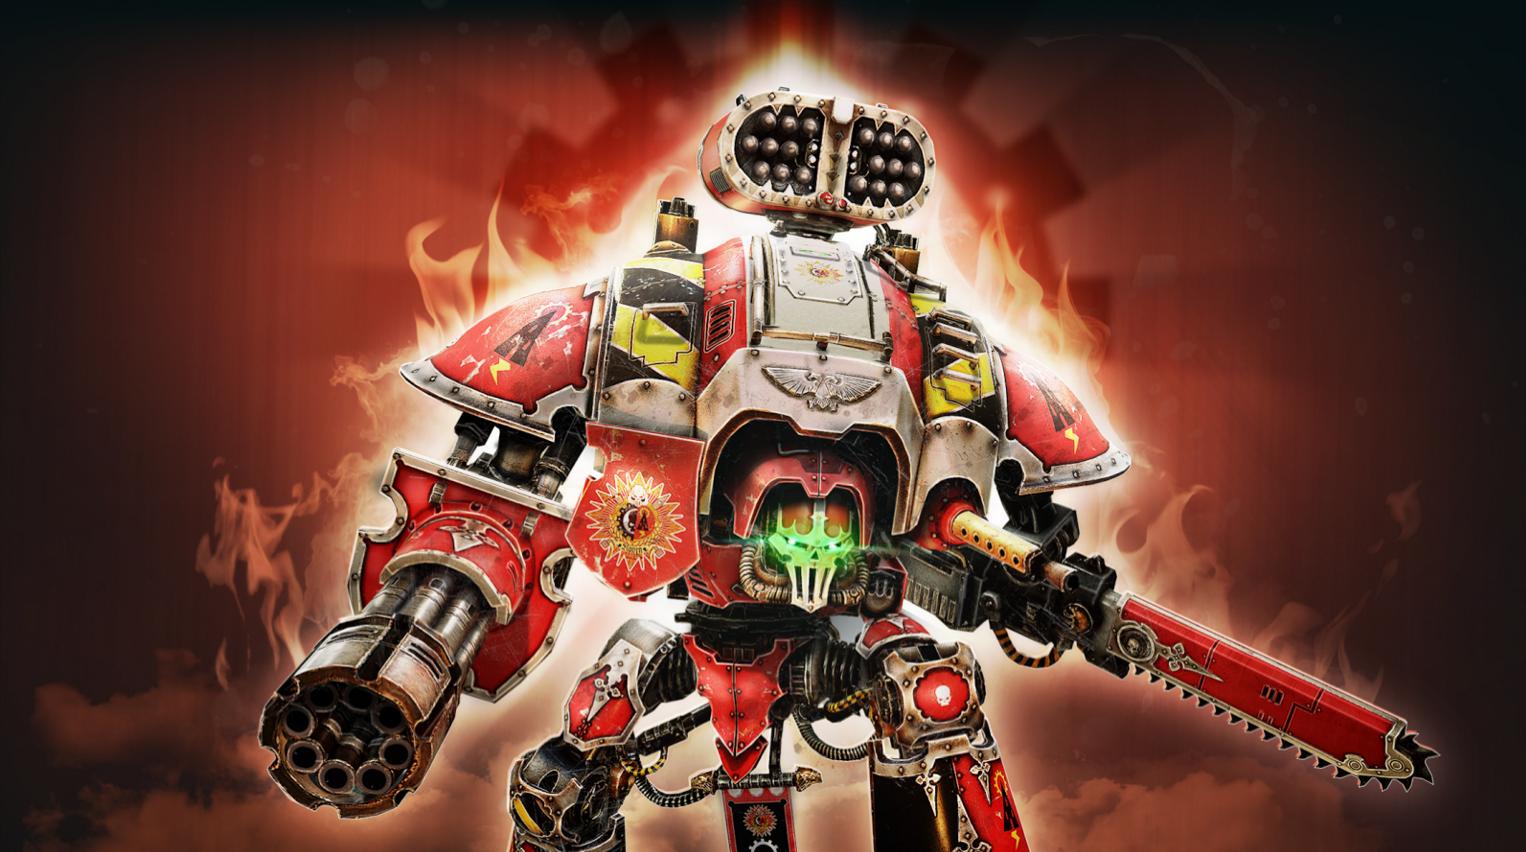 Warhammer_40k_40000_Freeblade_Play_Store_4